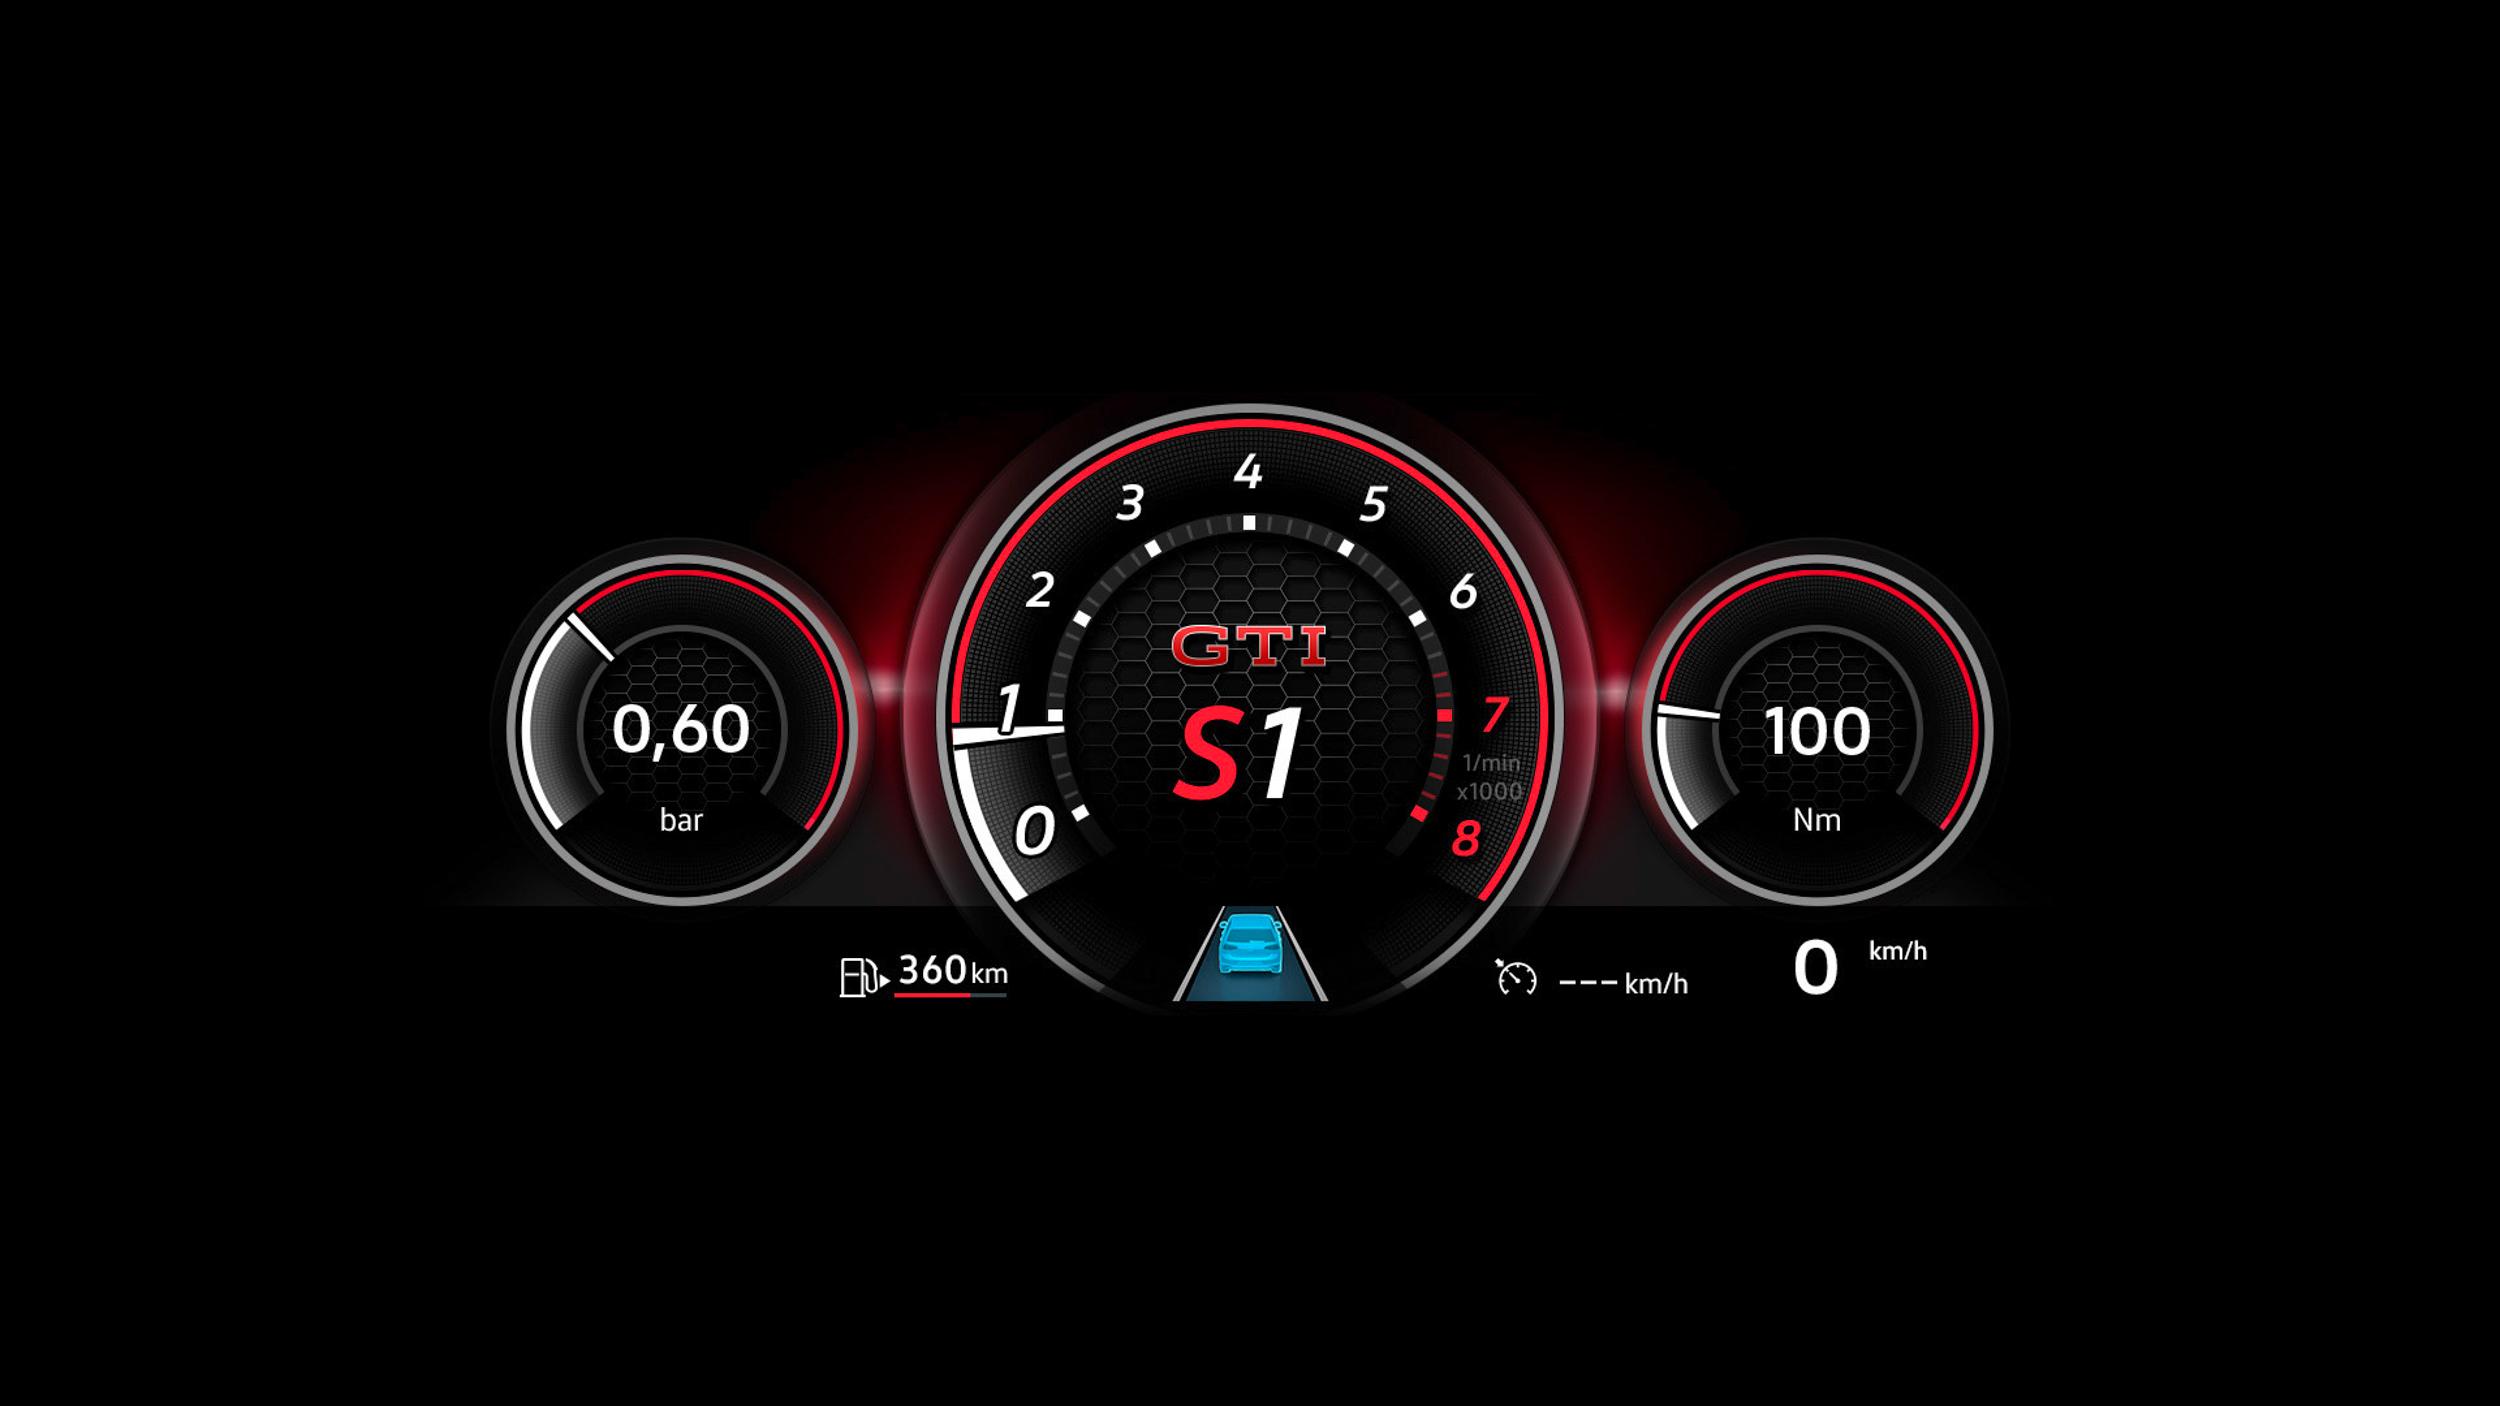 Golf 8 GTI配備的 Digital Cockpit Pro 10.25吋全邏輯數位化儀表有著專屬介面設計。